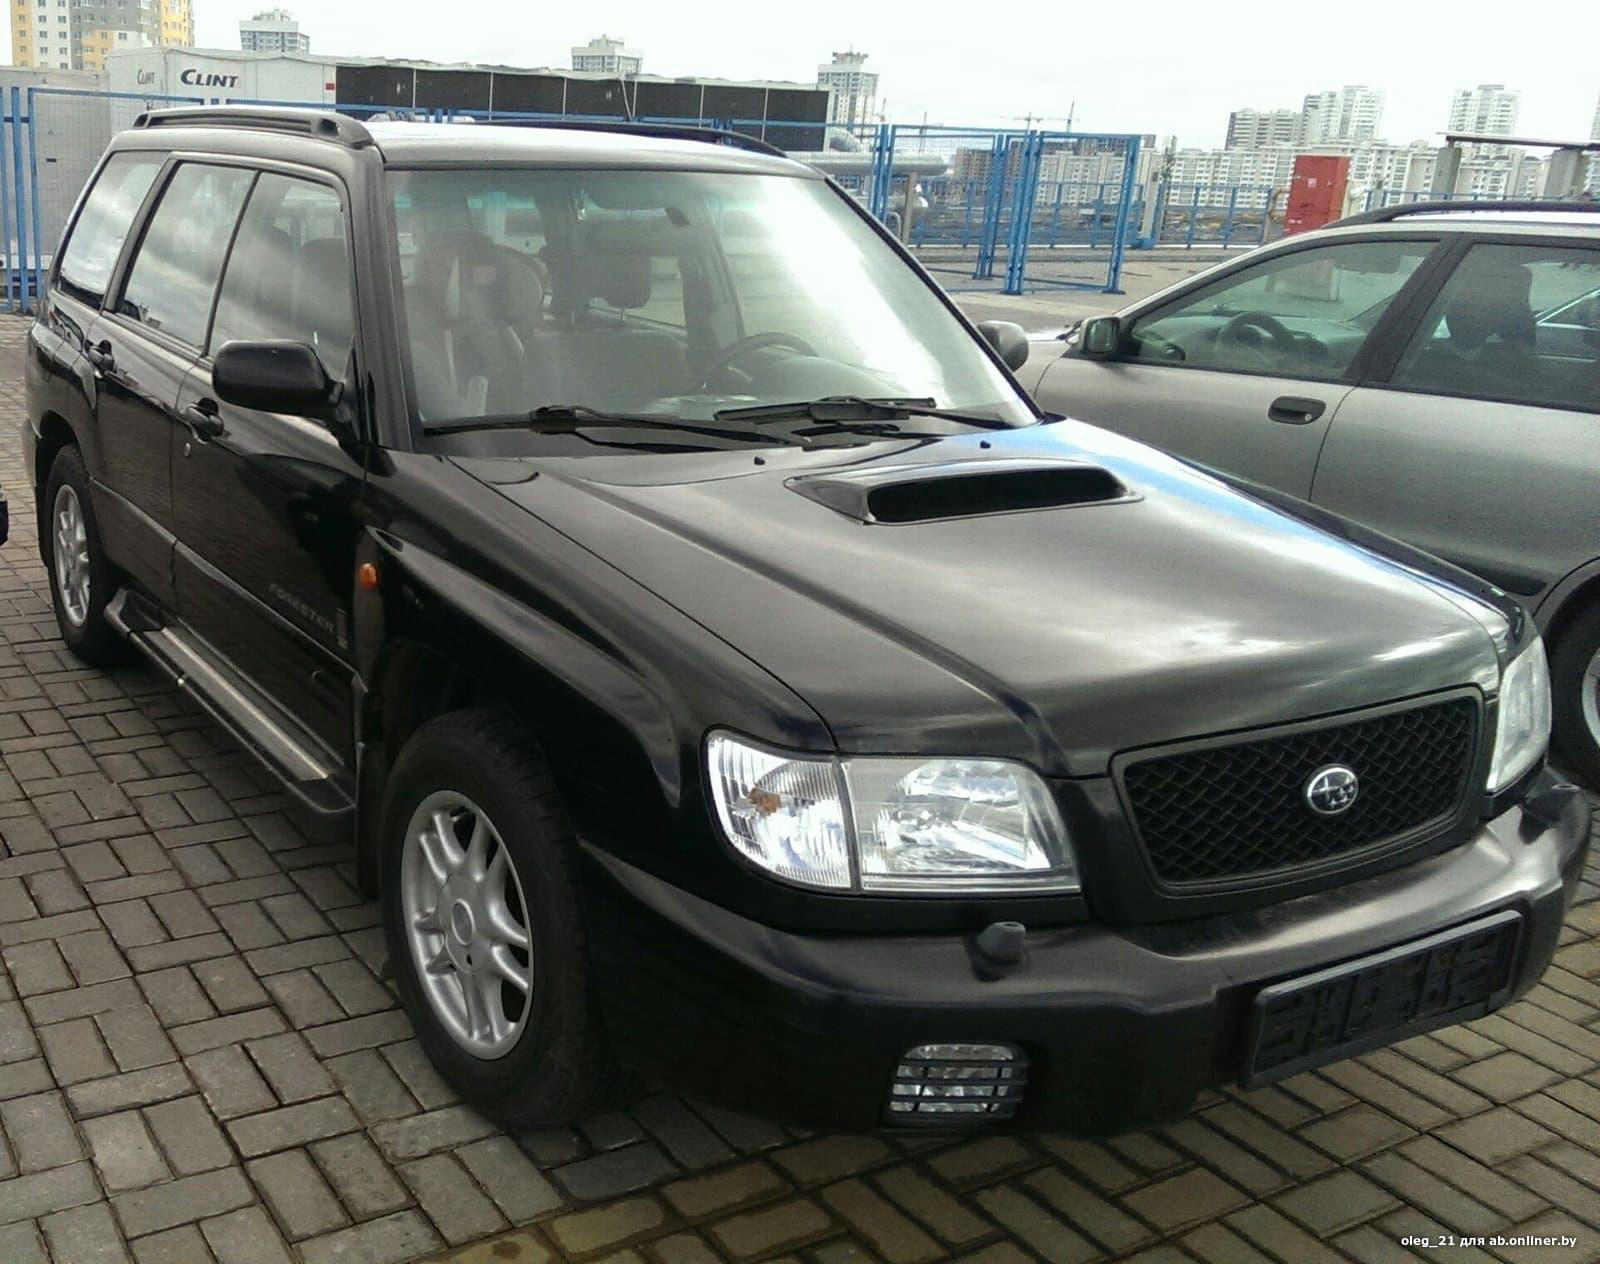 Subaru Forester s turbo